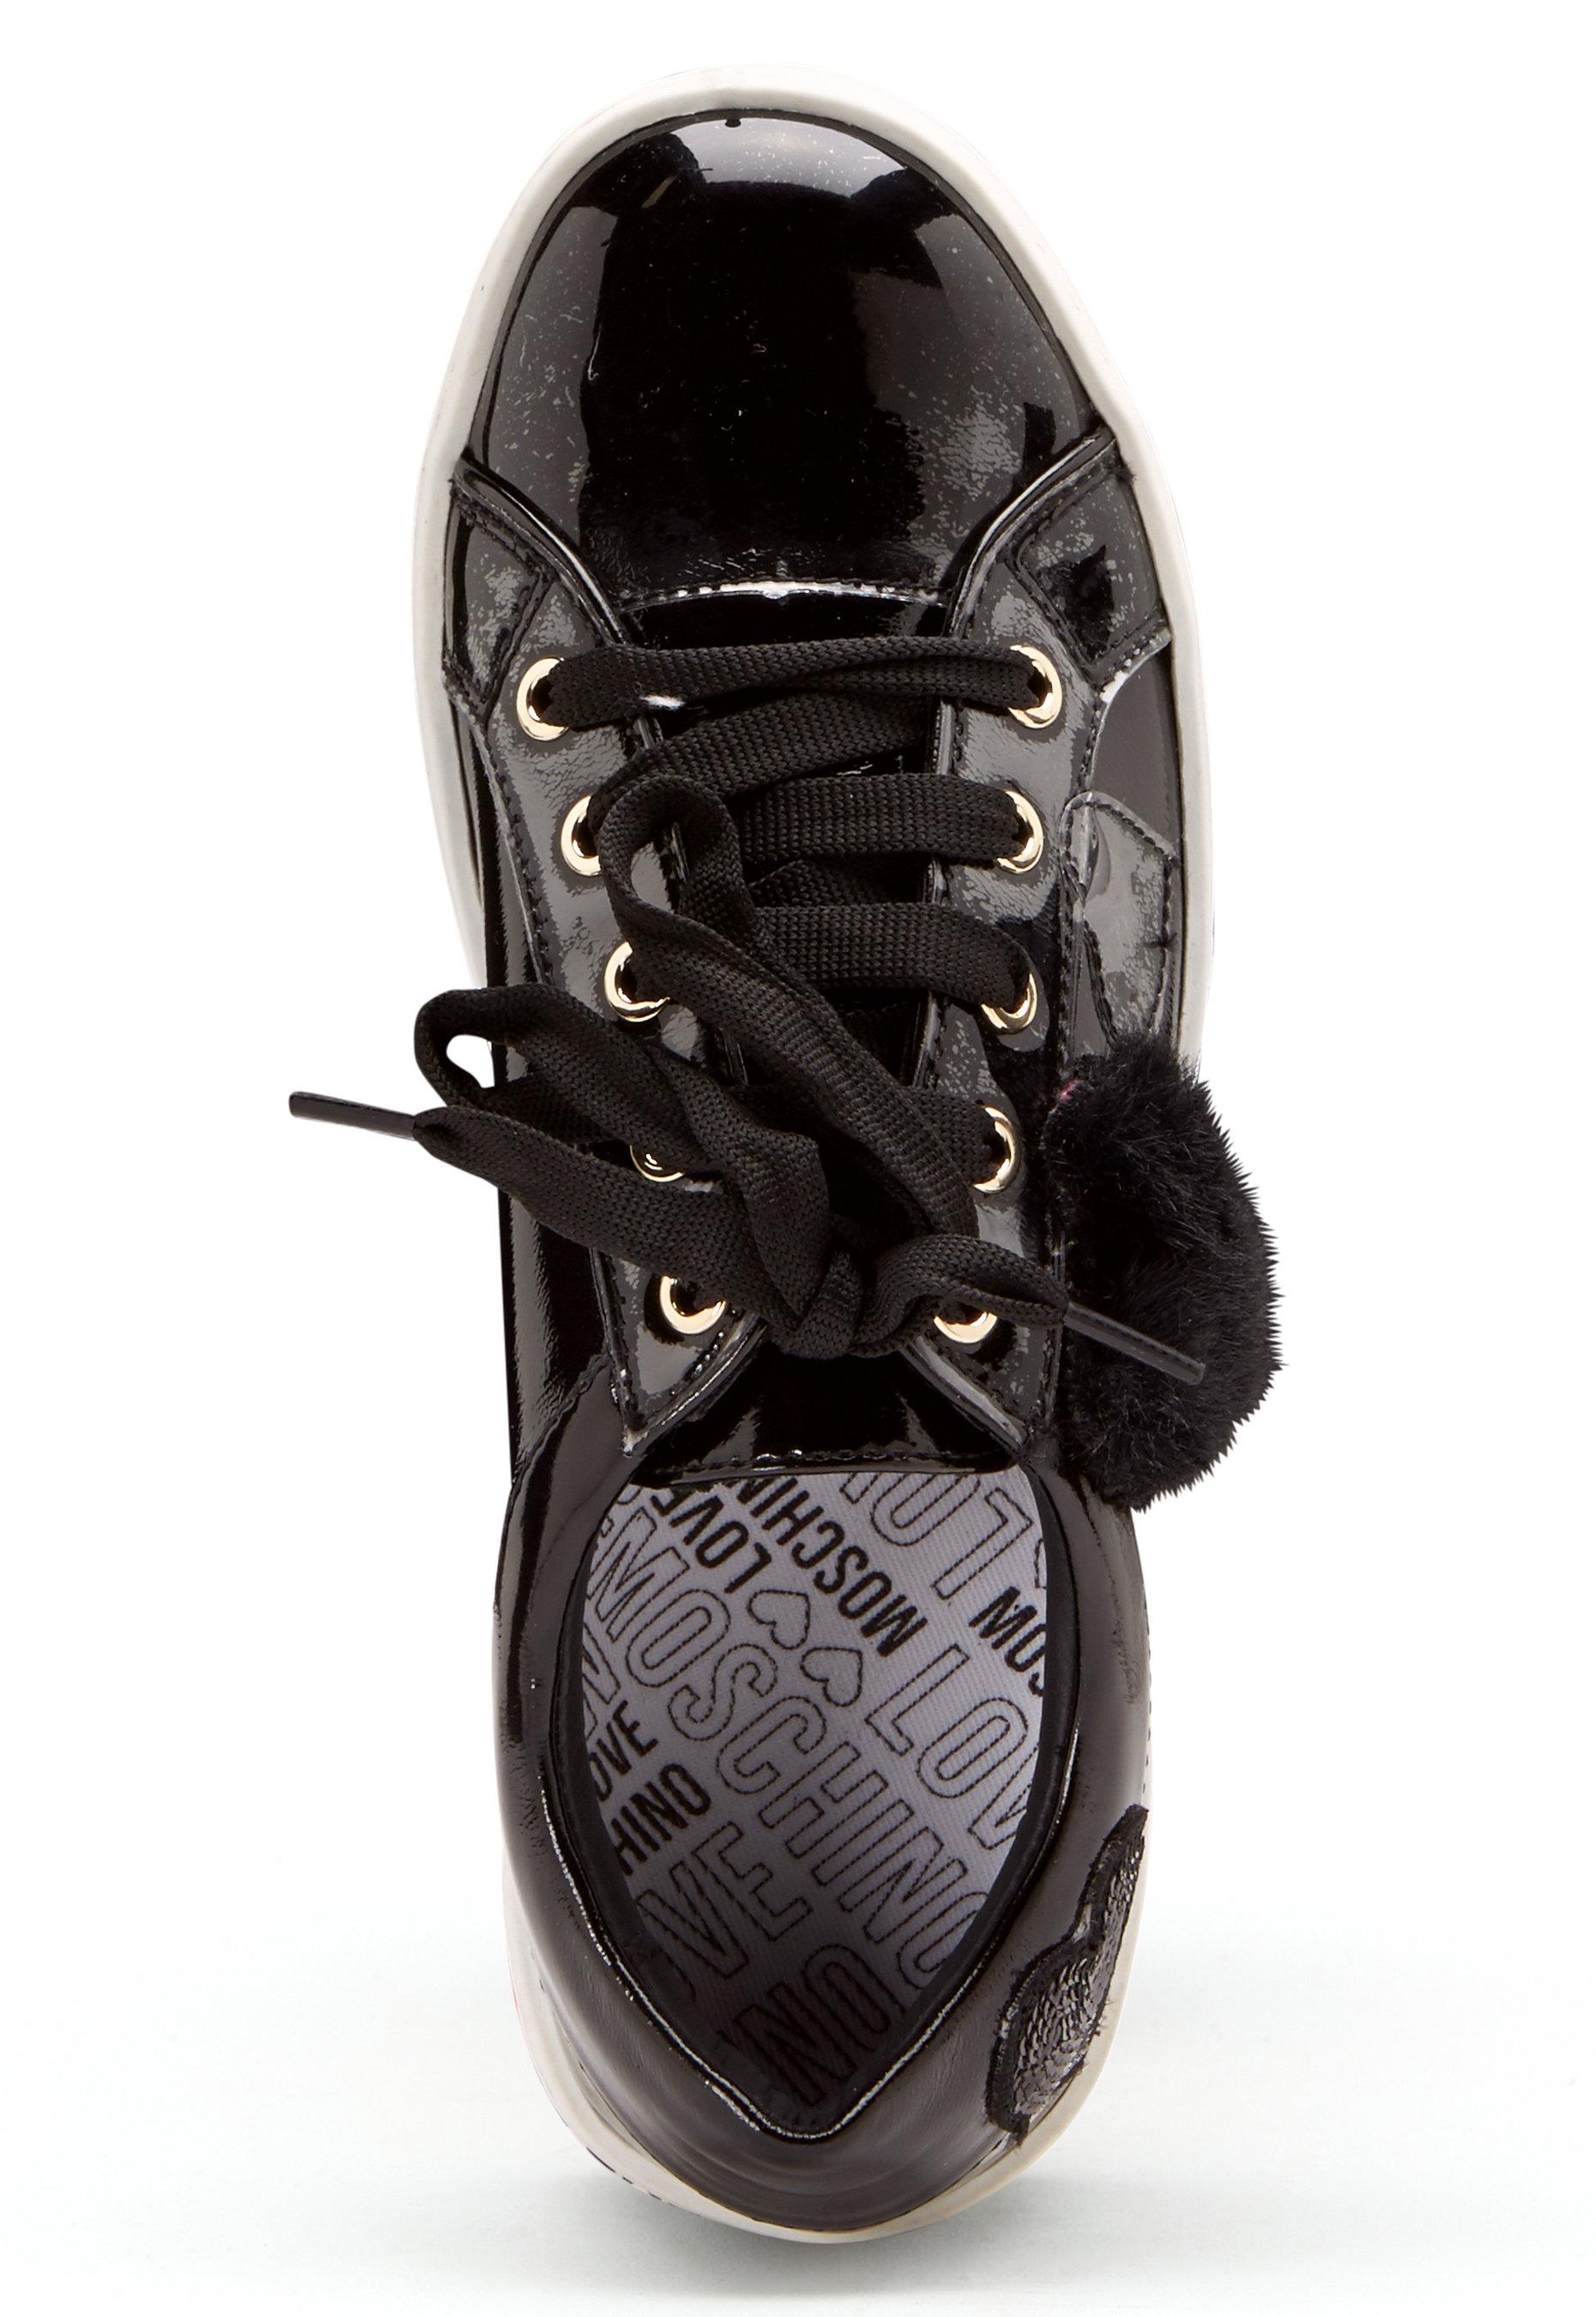 outlet store b9657 4ba3d Love Moschino Moschino Shoe Nero - Bubbleroom